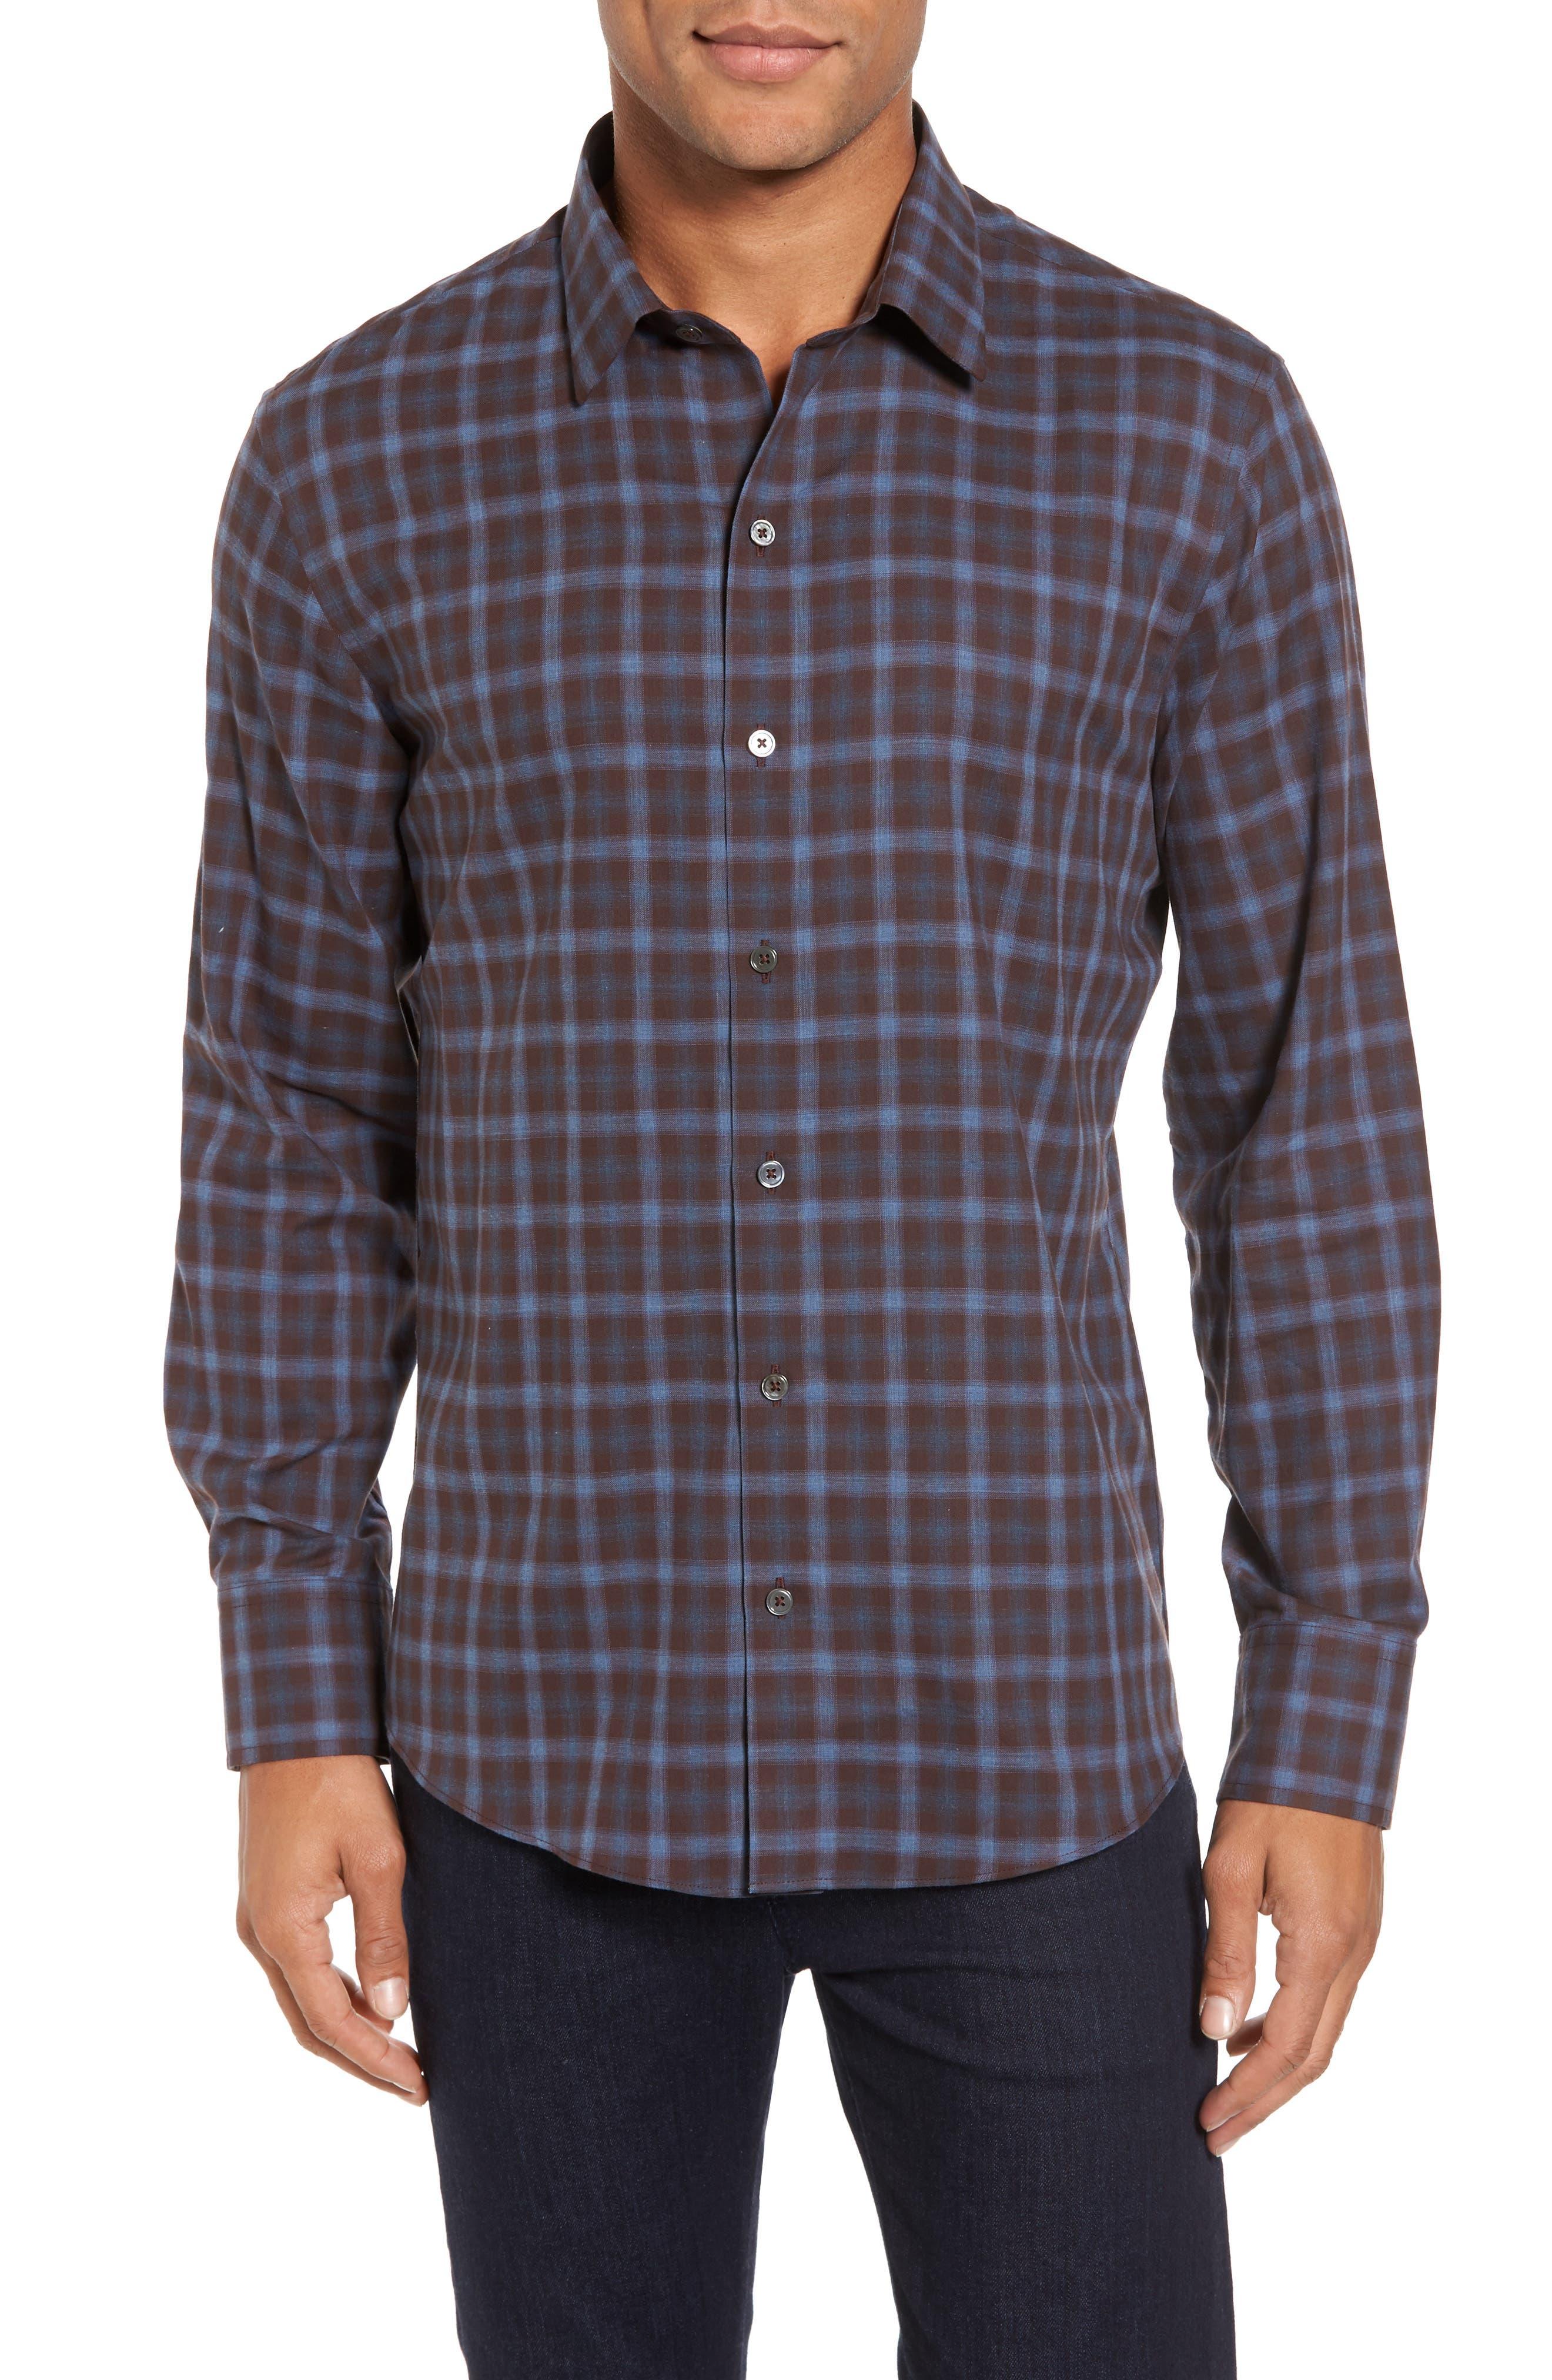 Fathollahi Slim Fit Plaid Sport Shirt,                         Main,                         color, Brown